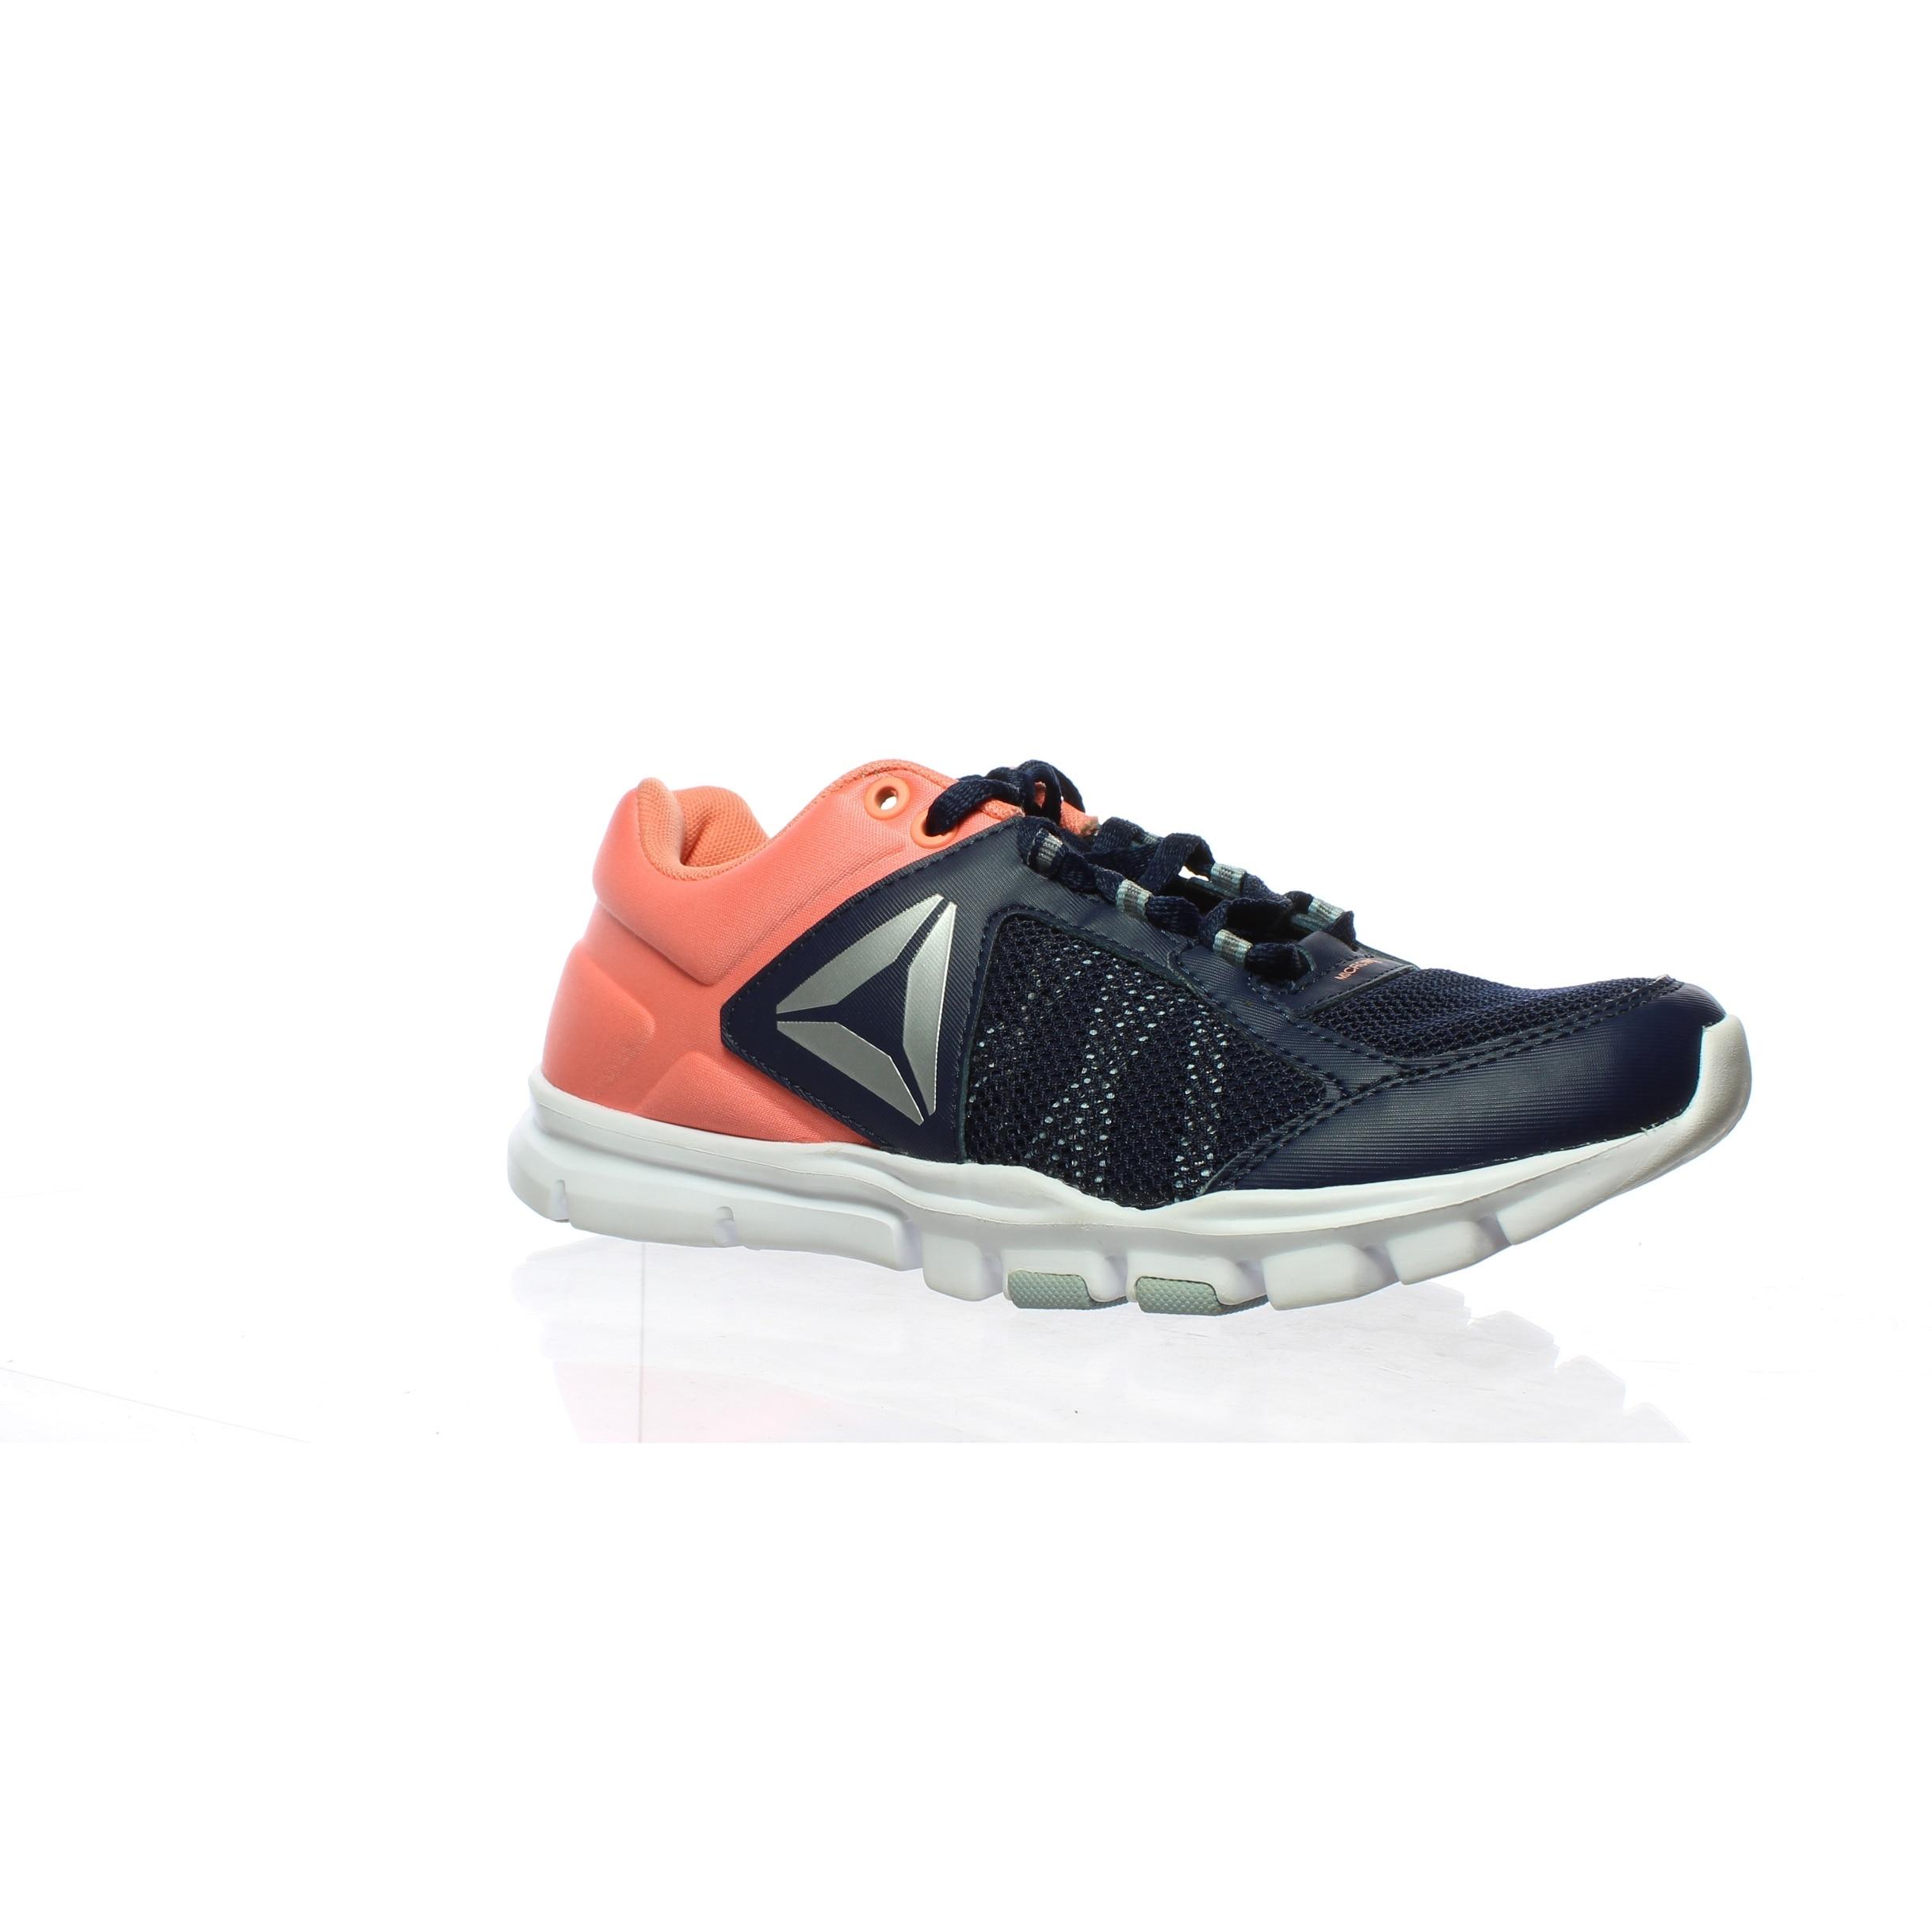 Reebok Womens Yourflex Trainette 9.0 Mt Blue Cross Training Shoes Size 6.5